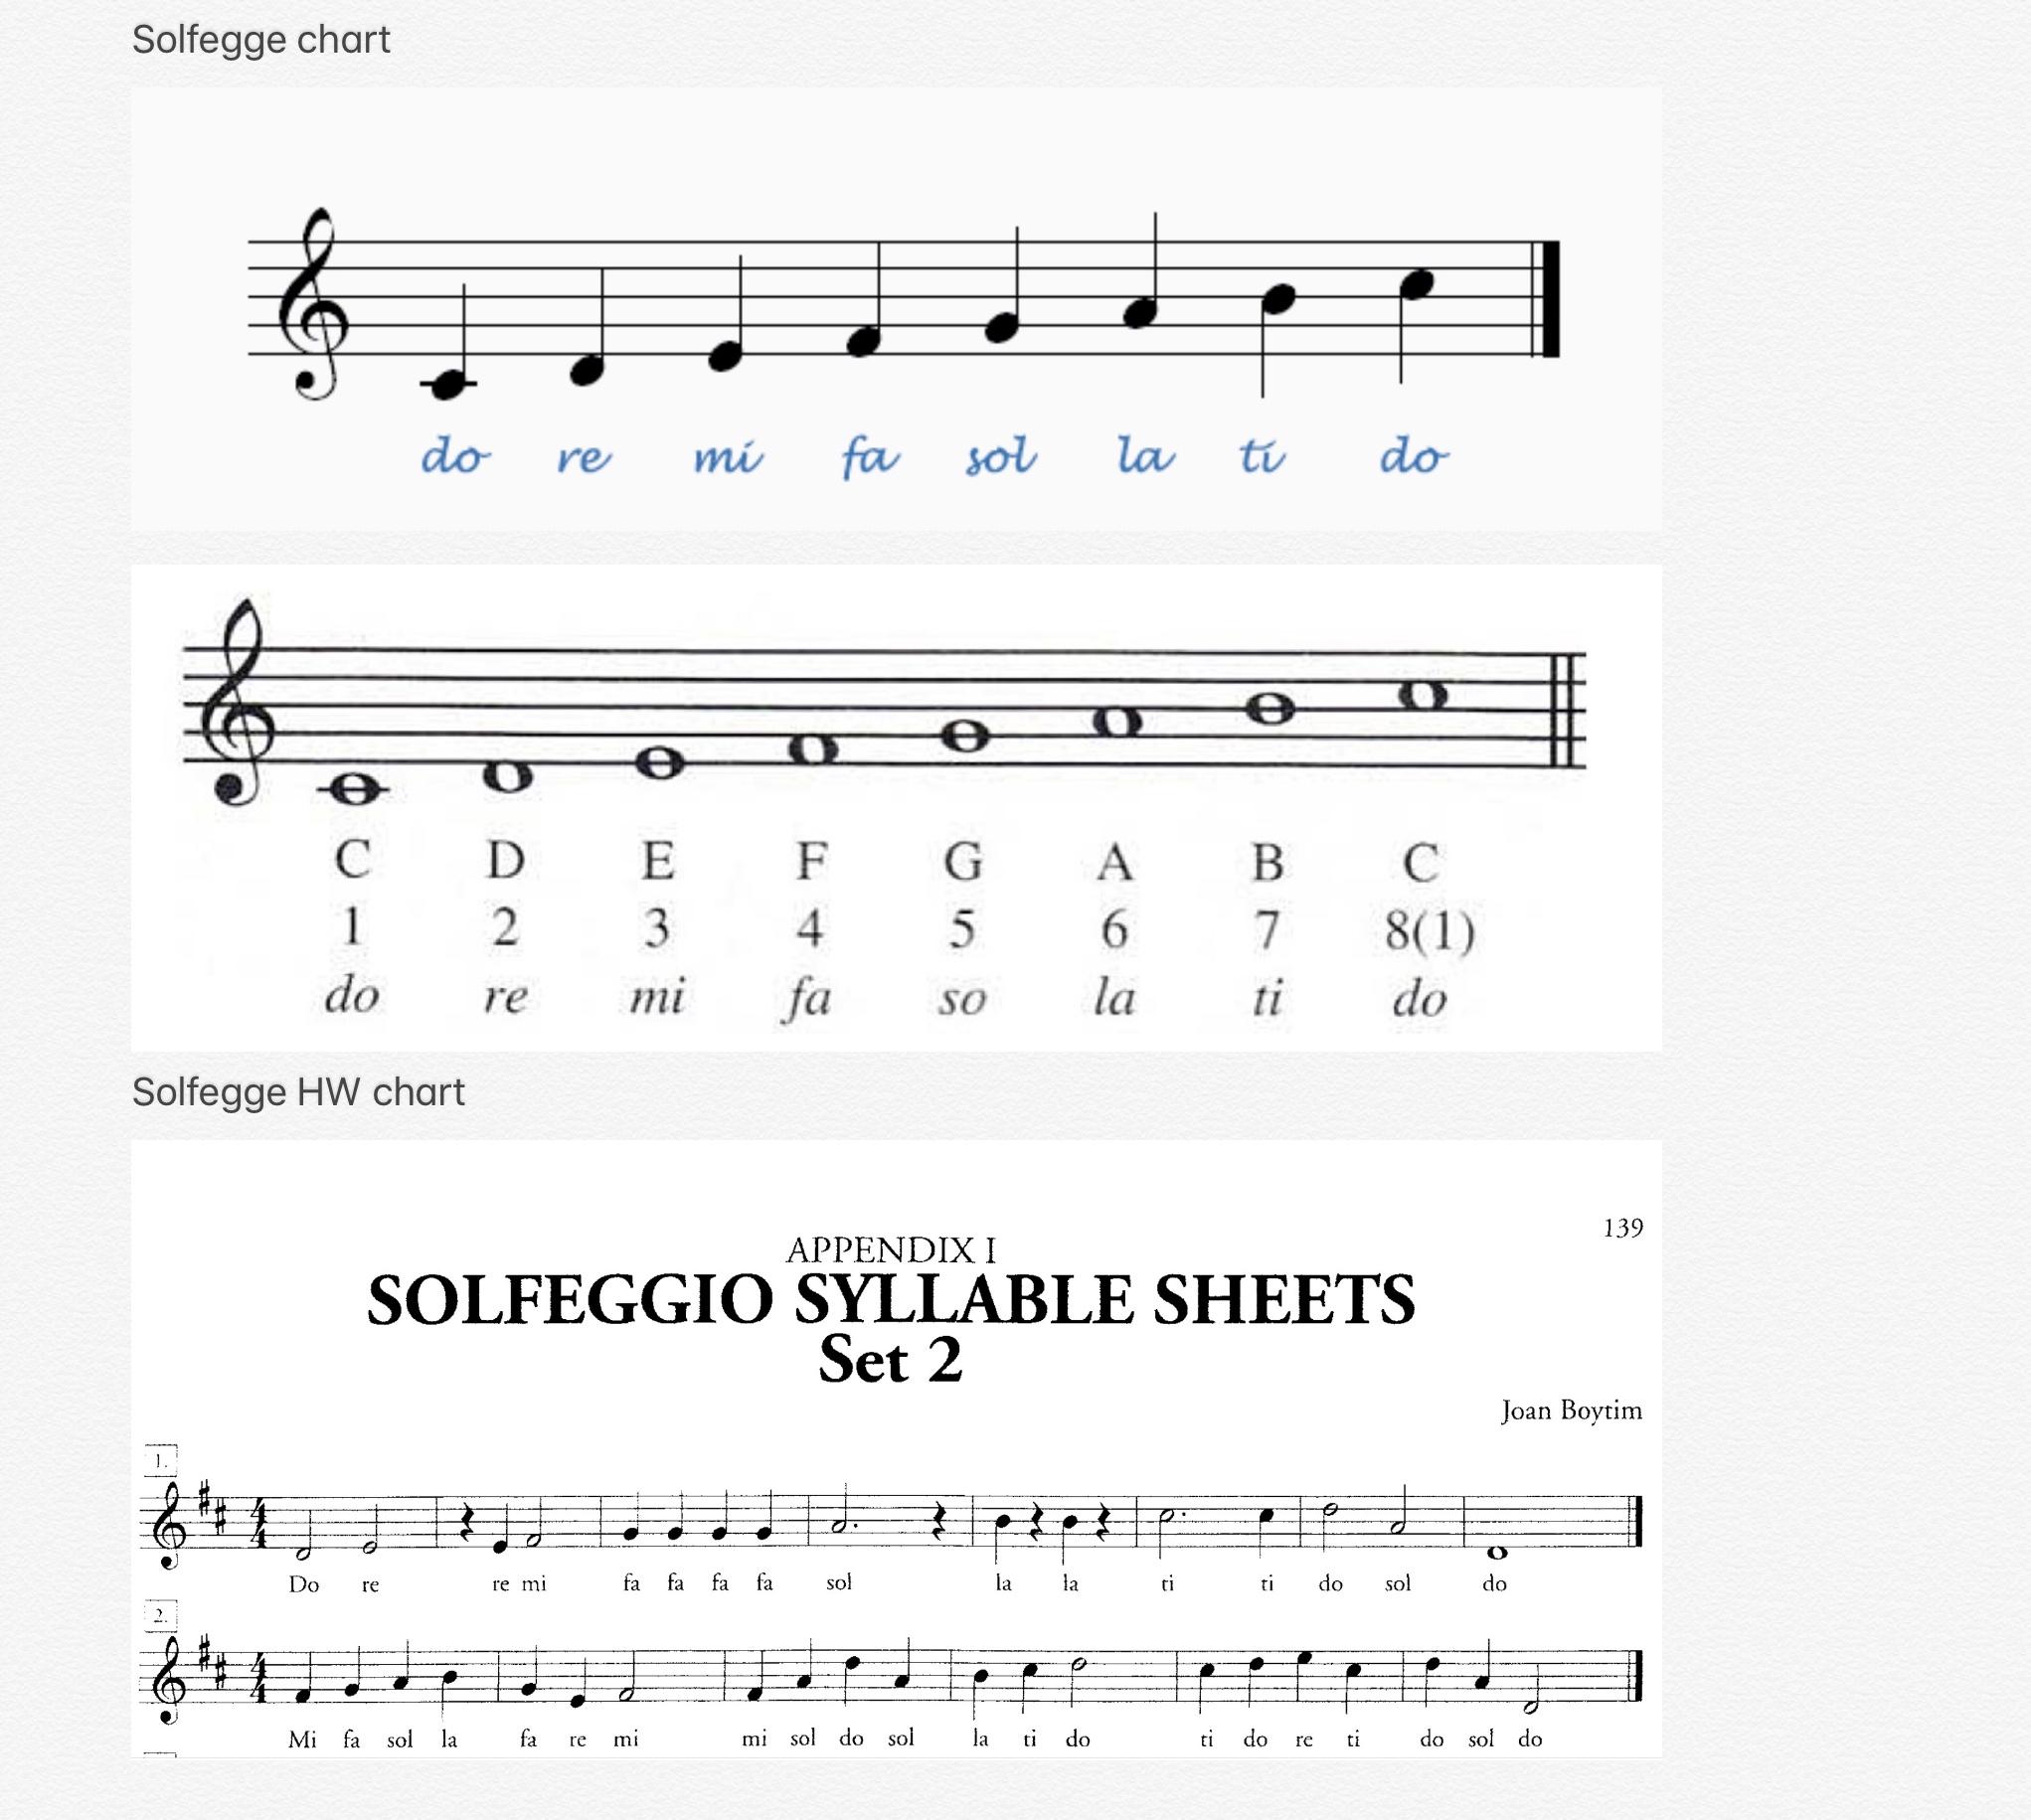 Beginning Solfegge Charts